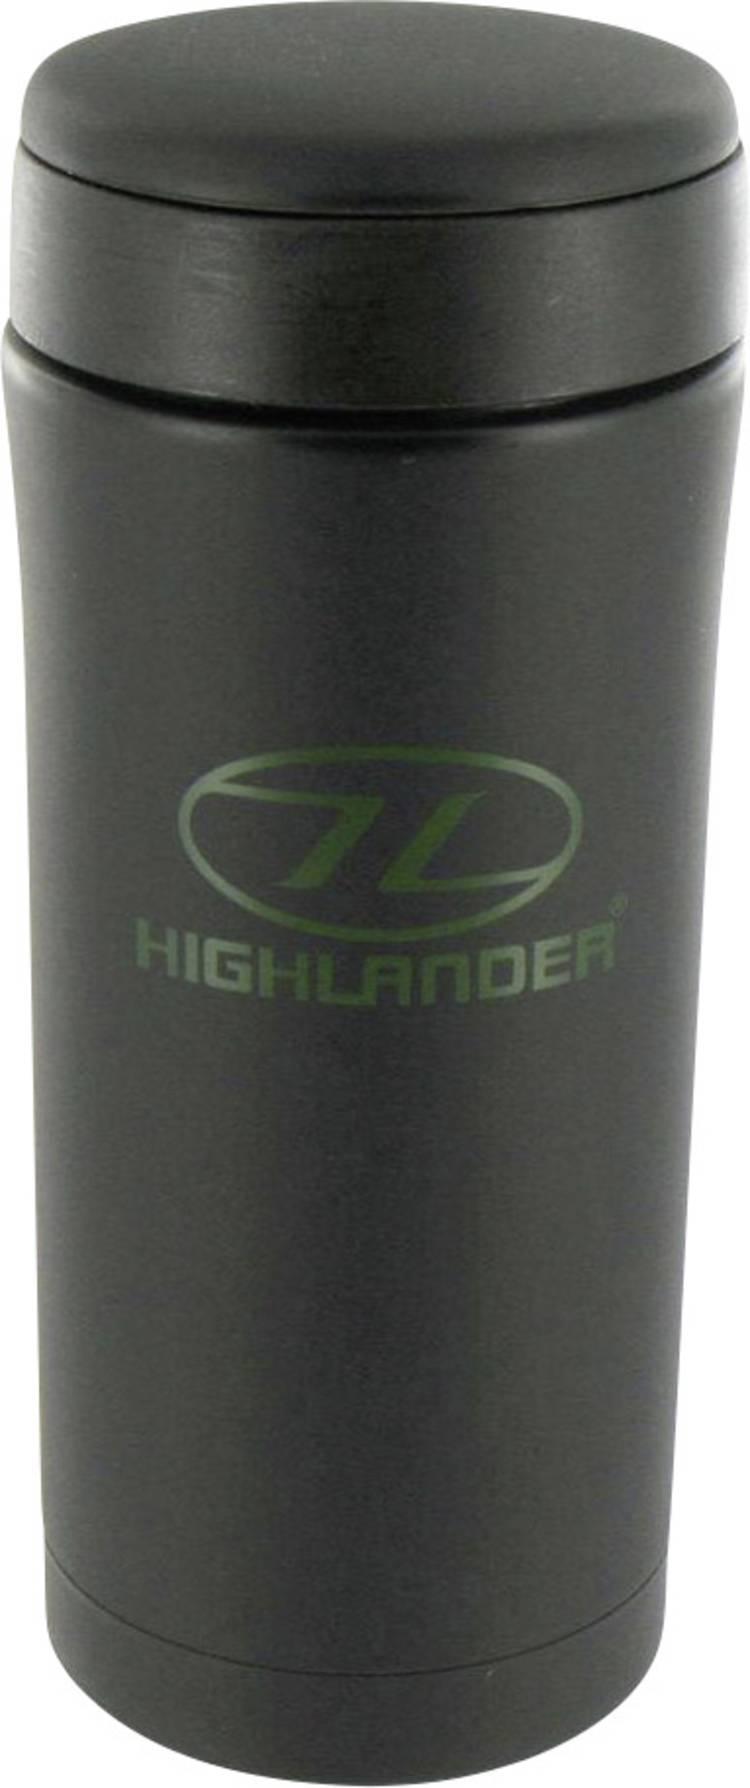 Image of Highlander Sealed Mug CP163-BK Thermosbeker Zwart 330 ml